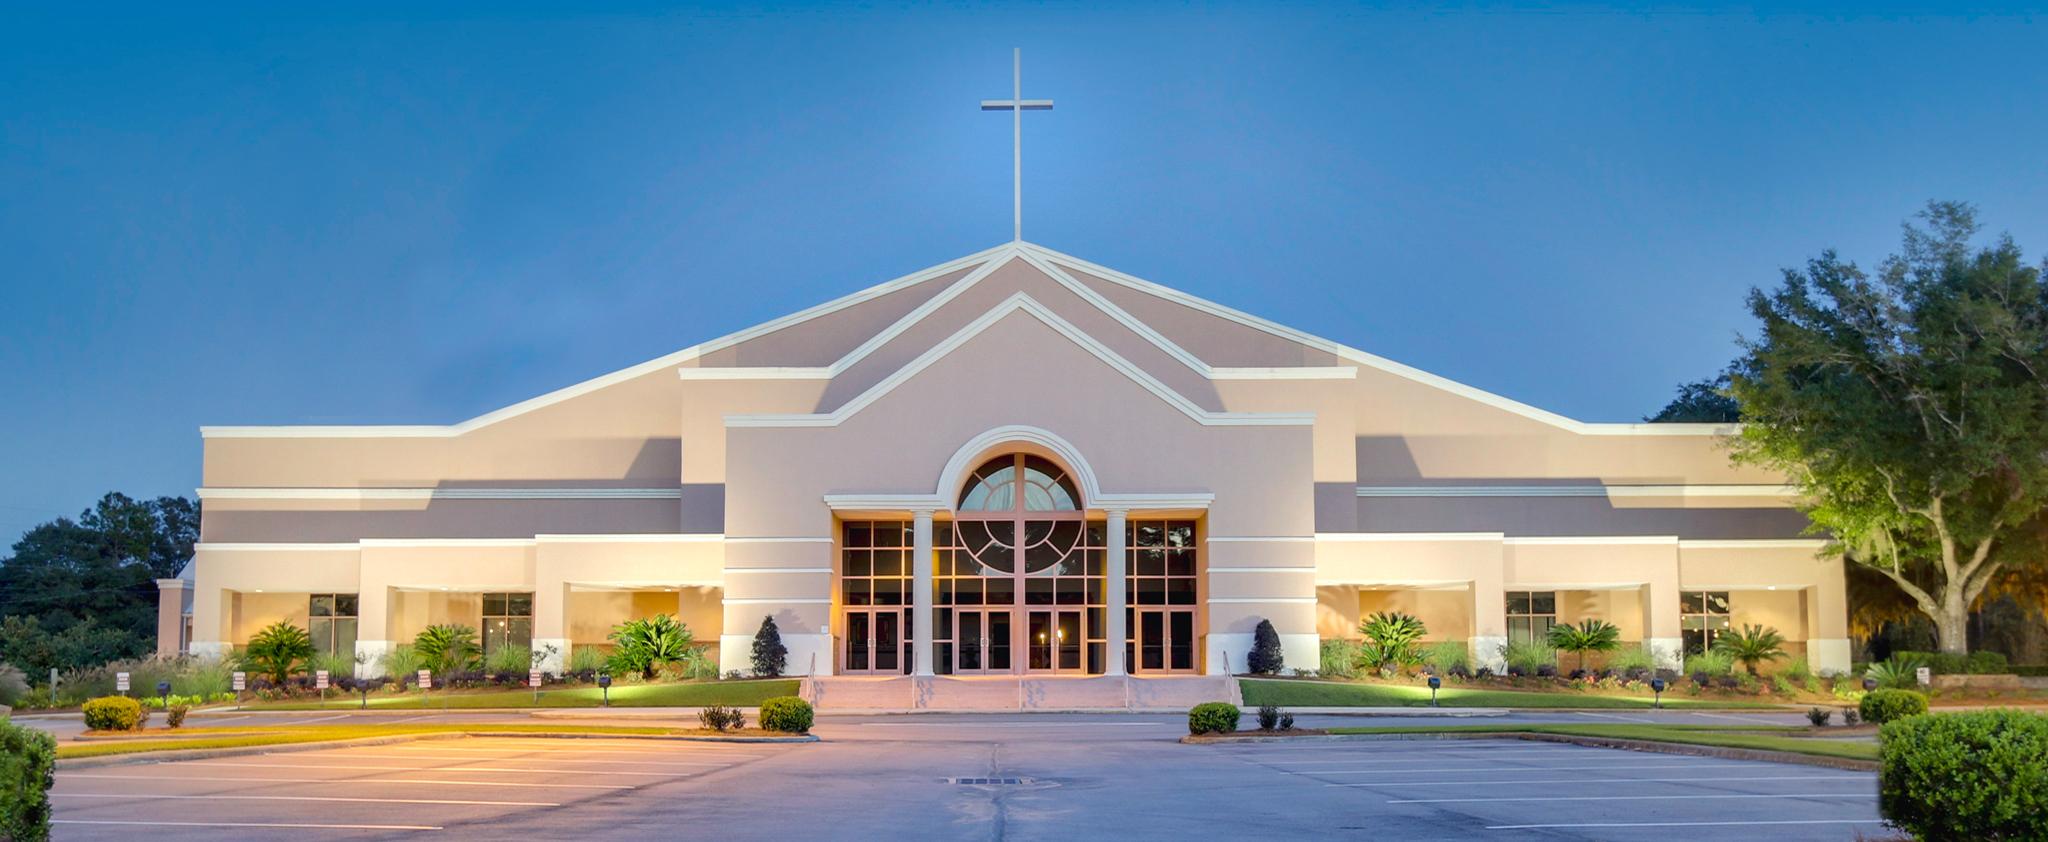 Central Pentecostal Ministries, Lynn Haven FL